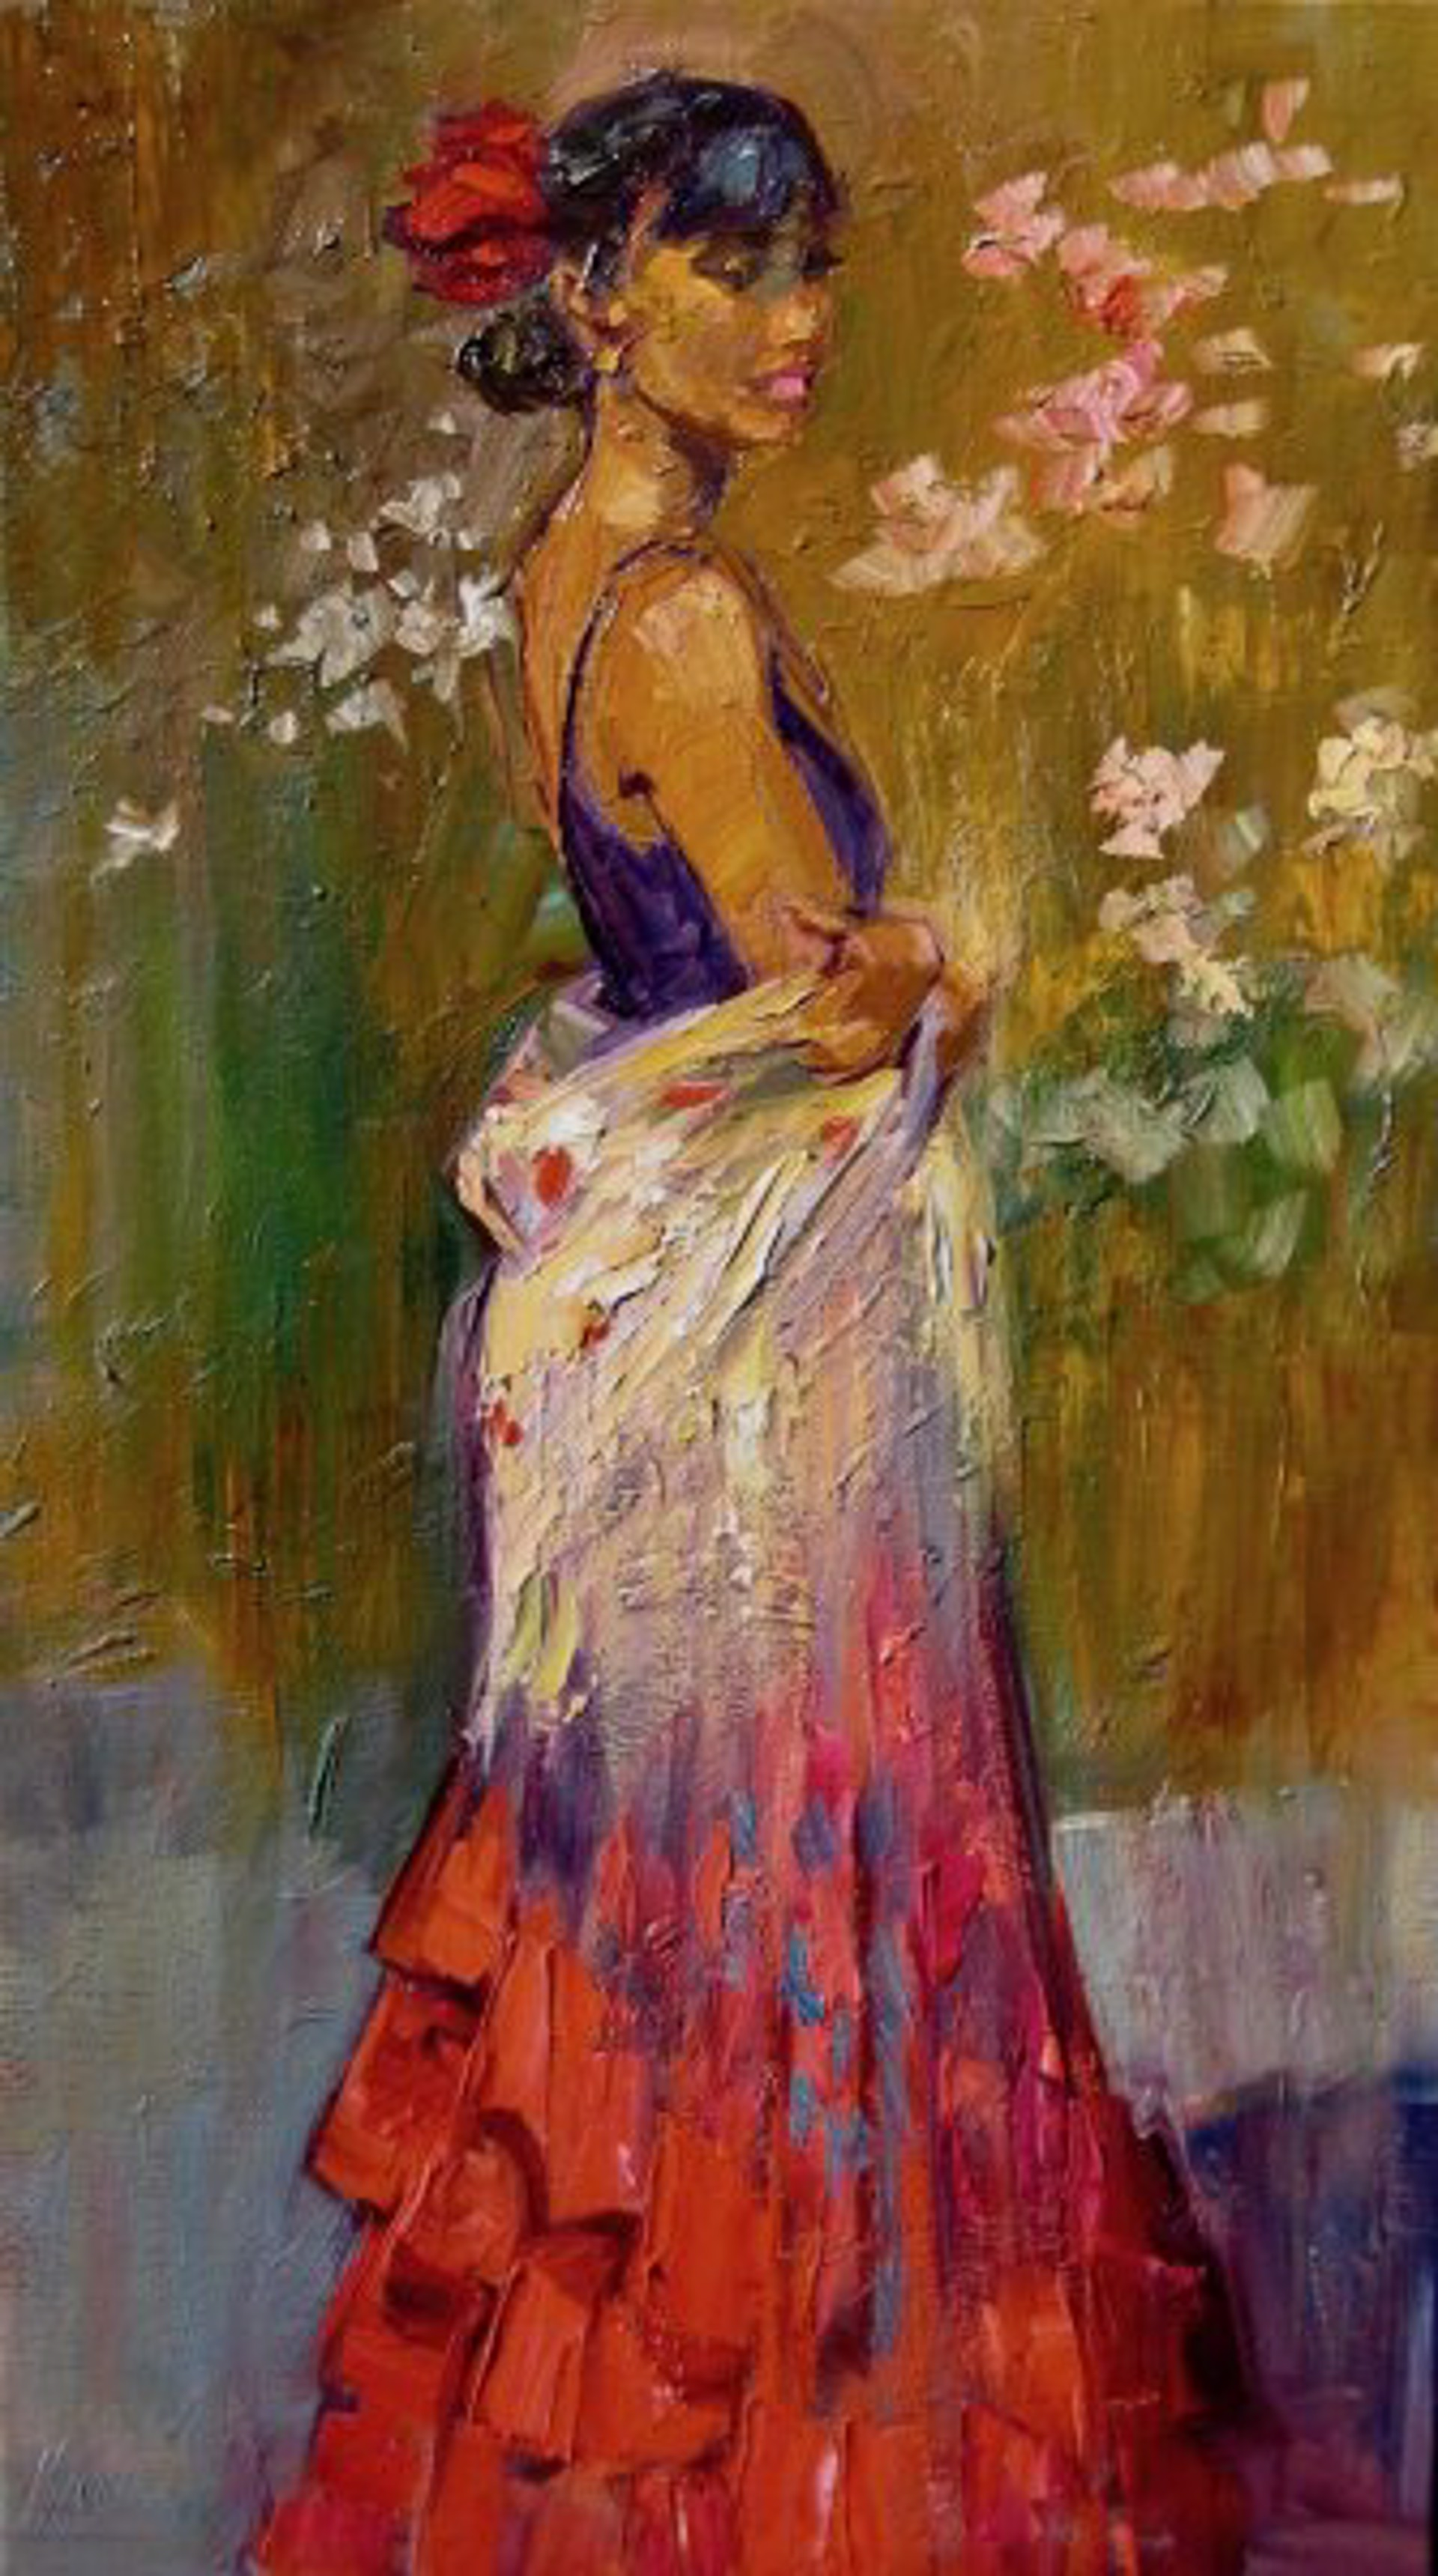 Flamenco Dancer by Maria Bertrán